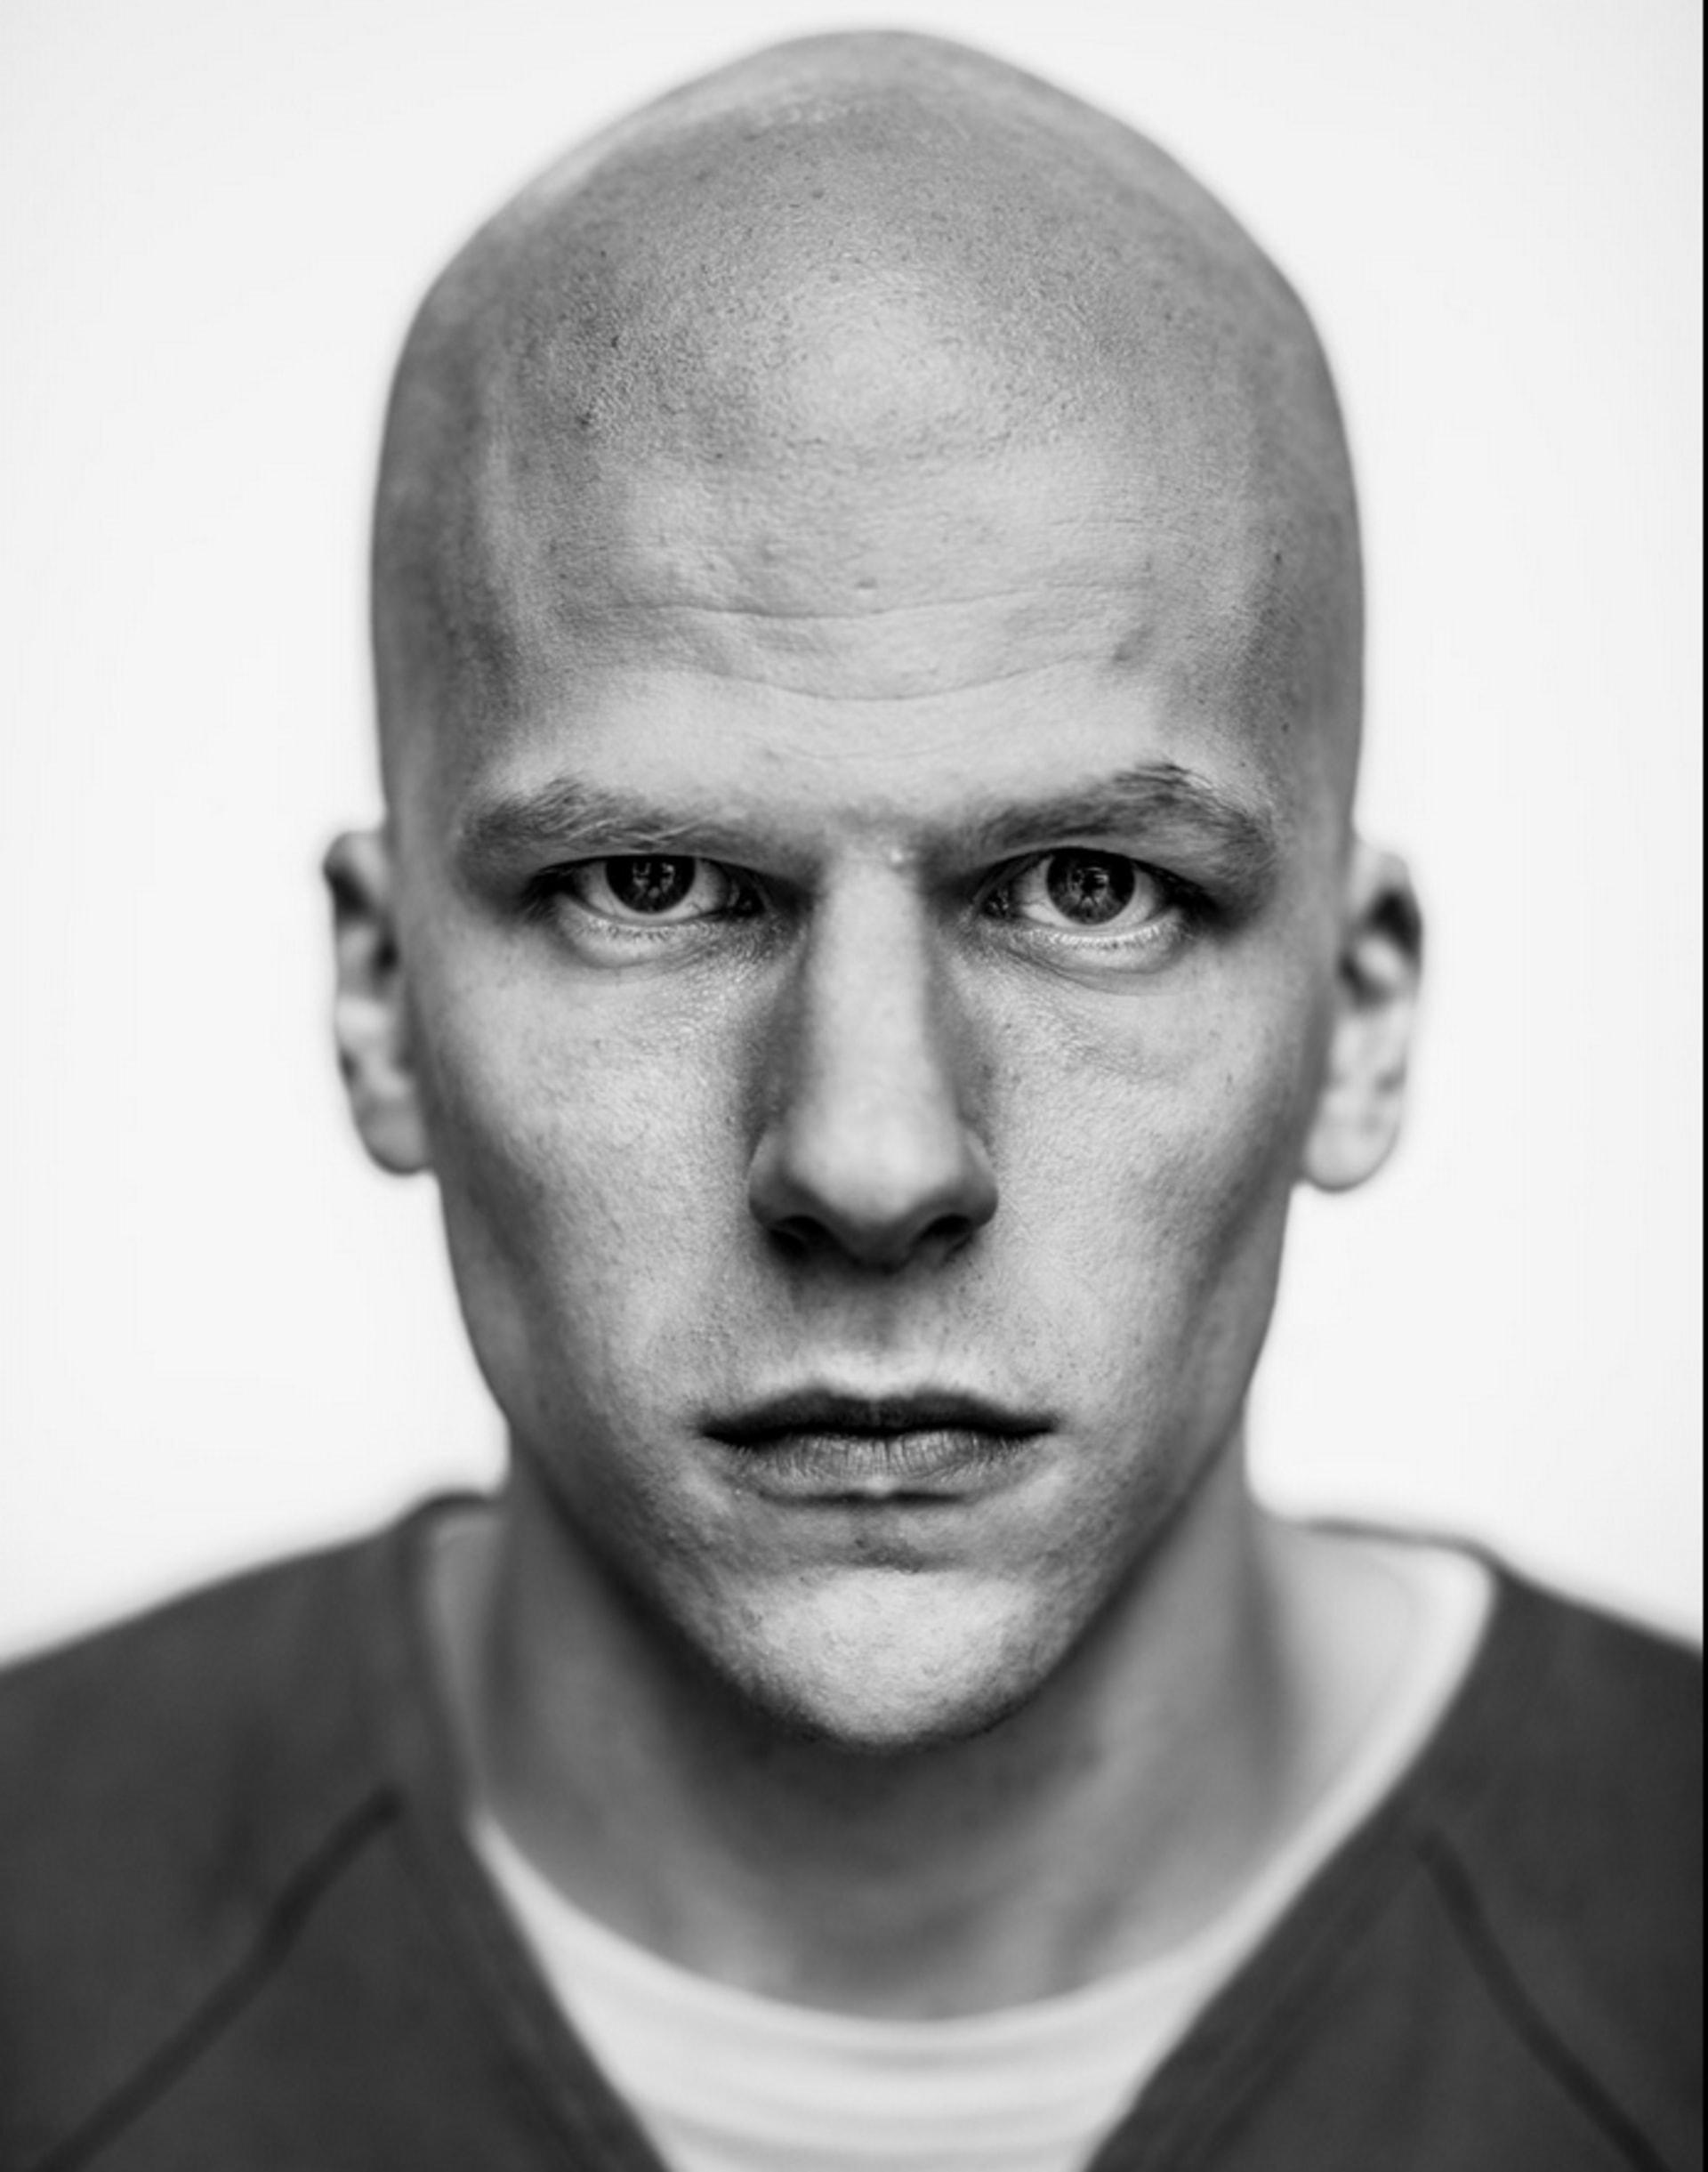 Jesse Eisenberg as bald Lex Luthor